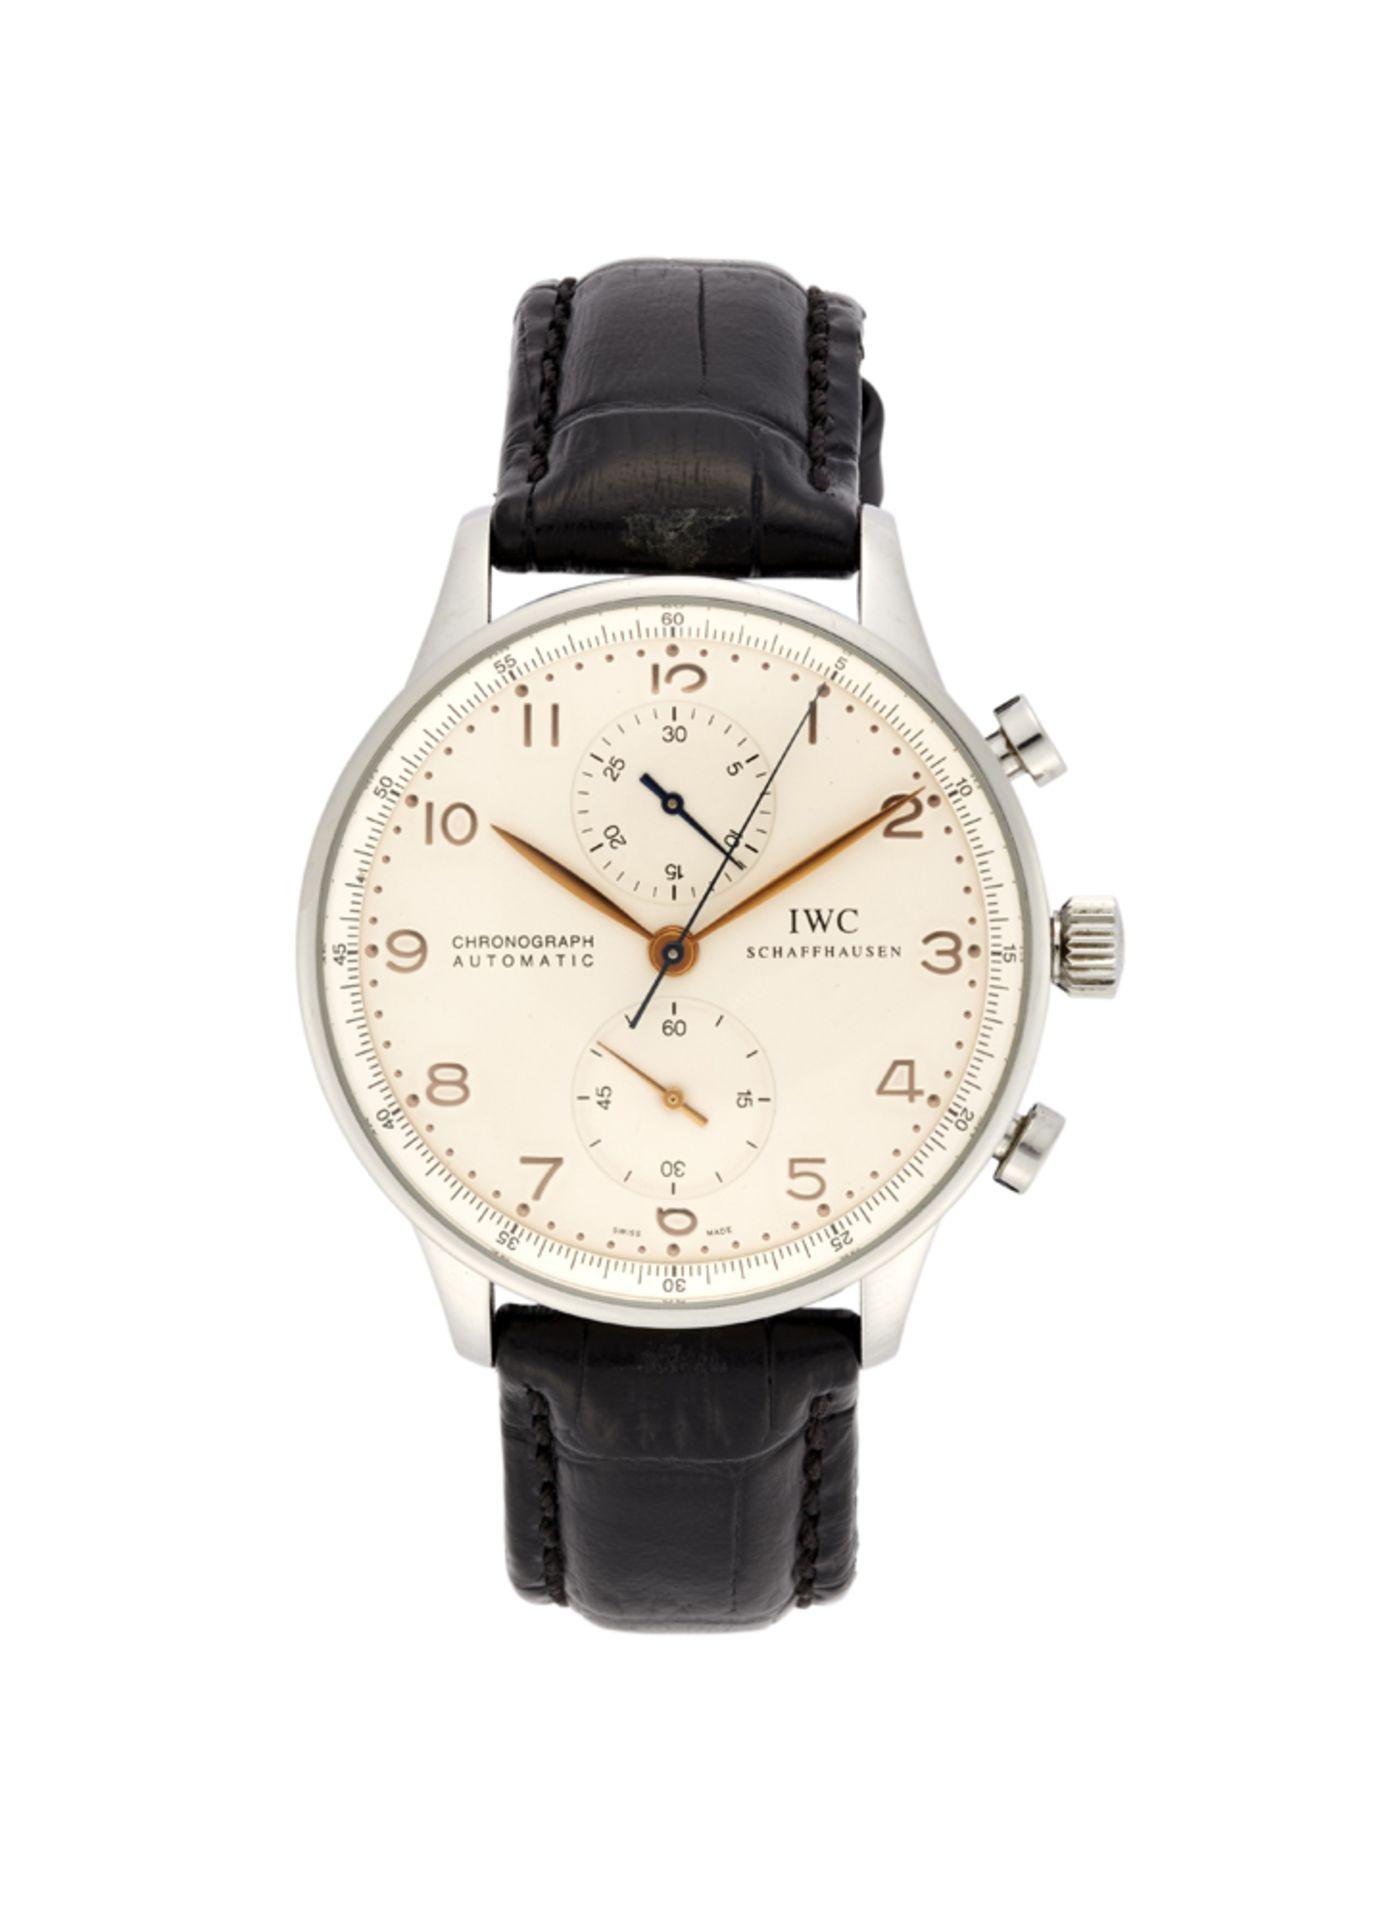 IWC PORTOGHESEGent's steel wristwatch2000sDial, movement and case signedAutomatic movementSilvered